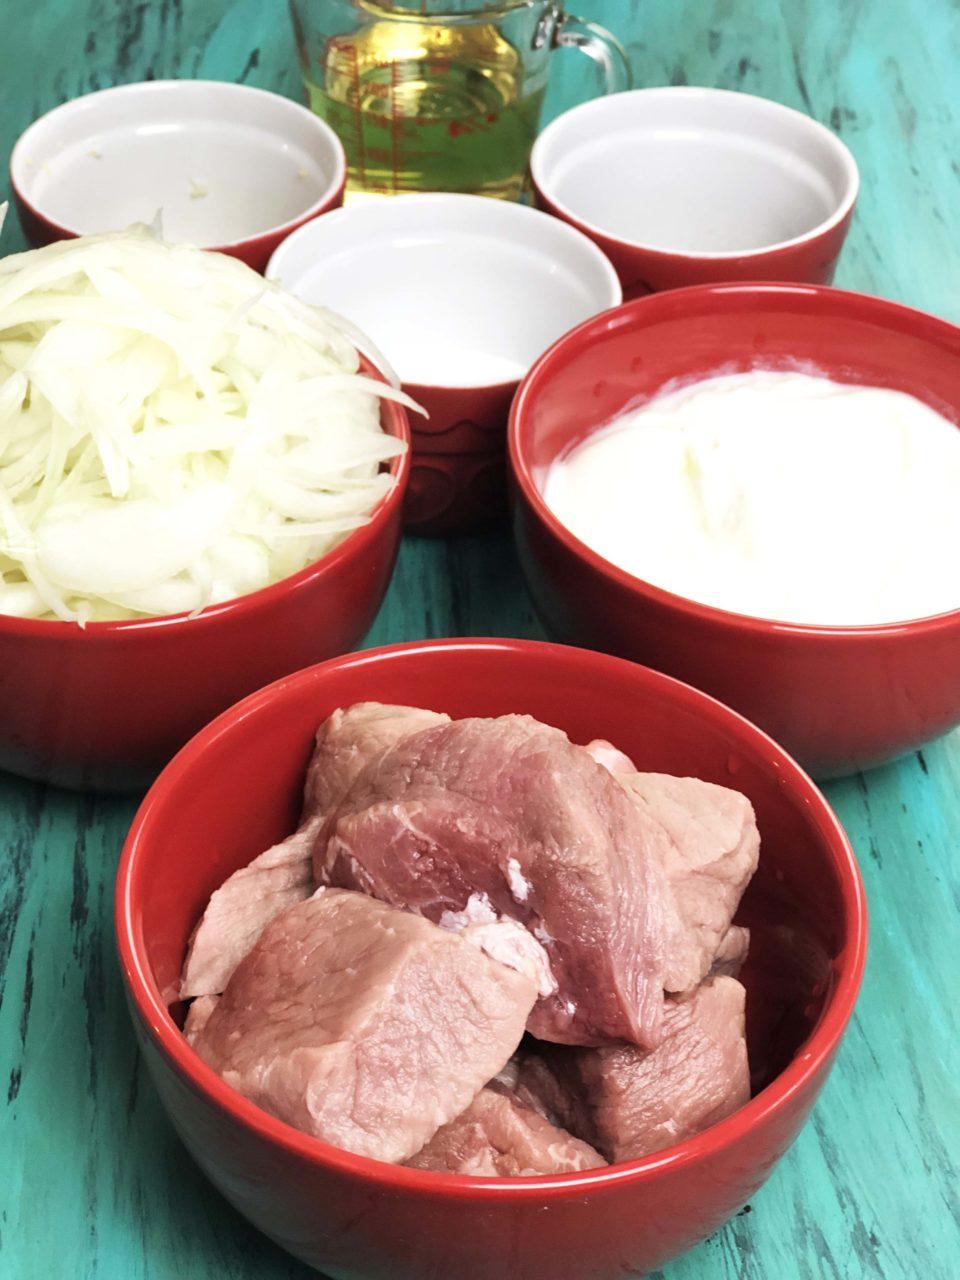 ingredients for kabab digi afghani